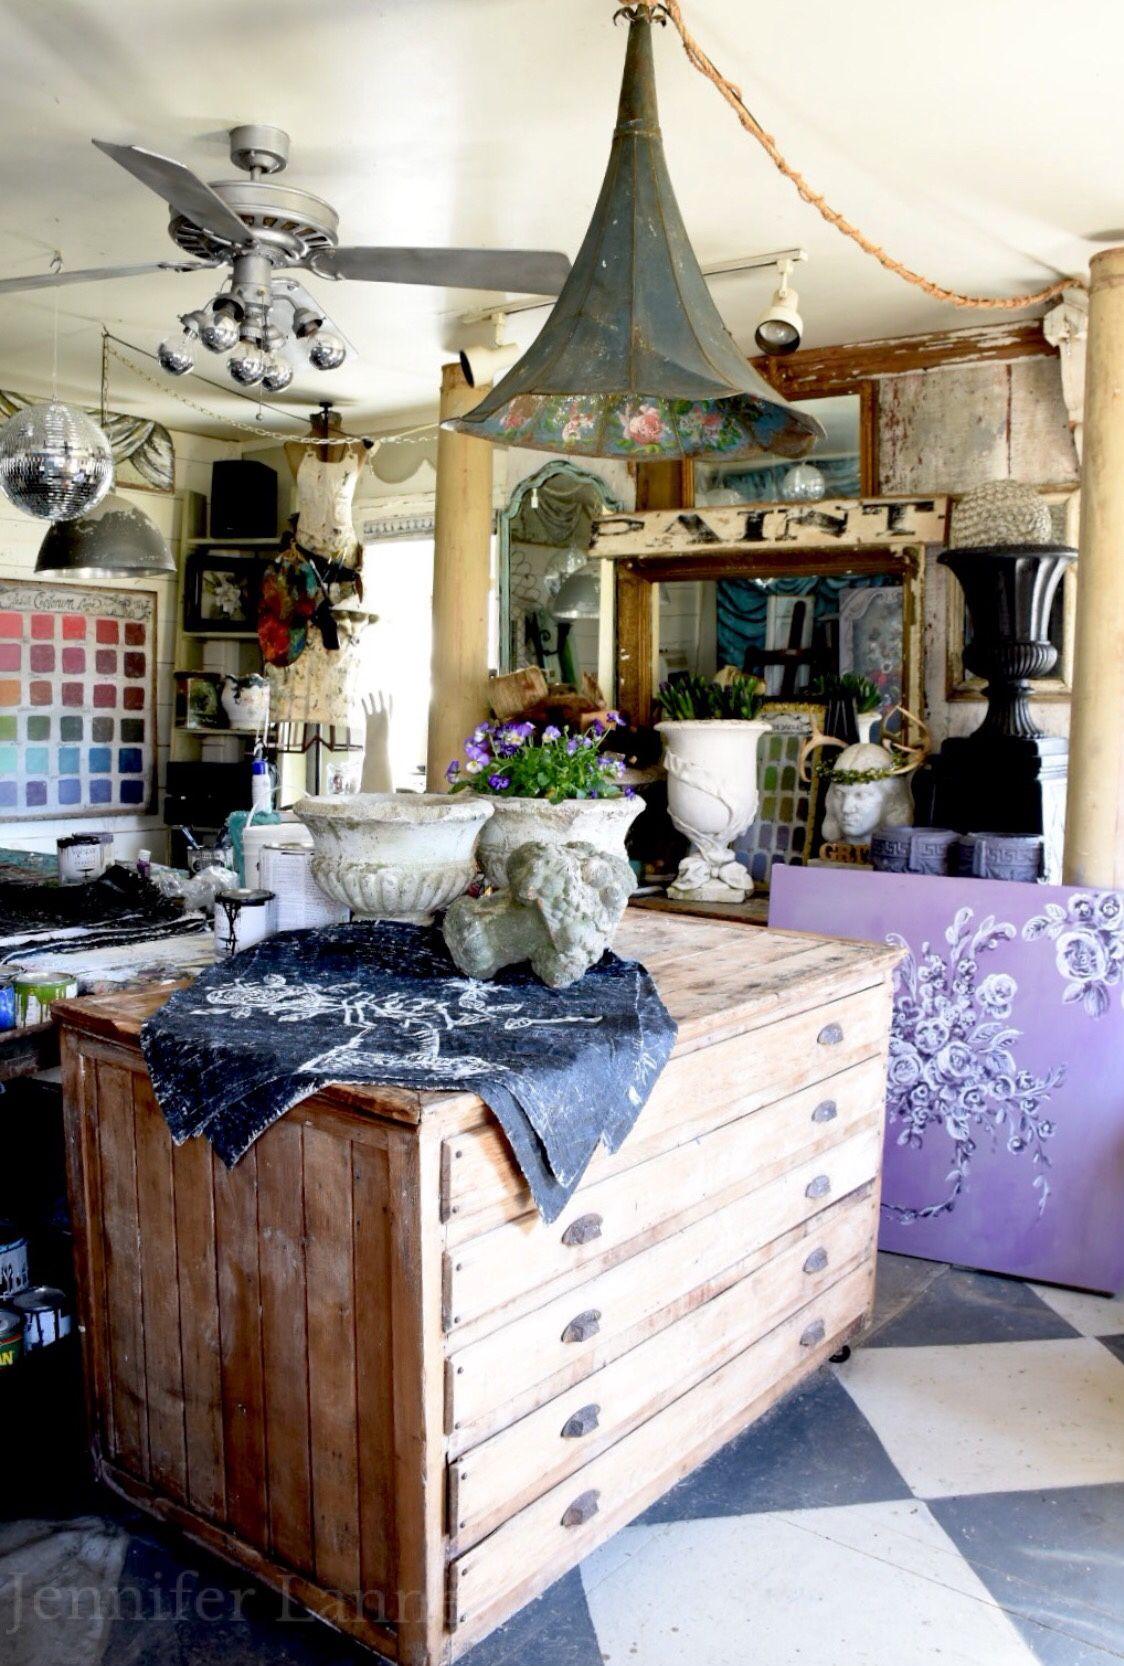 Jennifer lanne artist studio studio decor cottage style